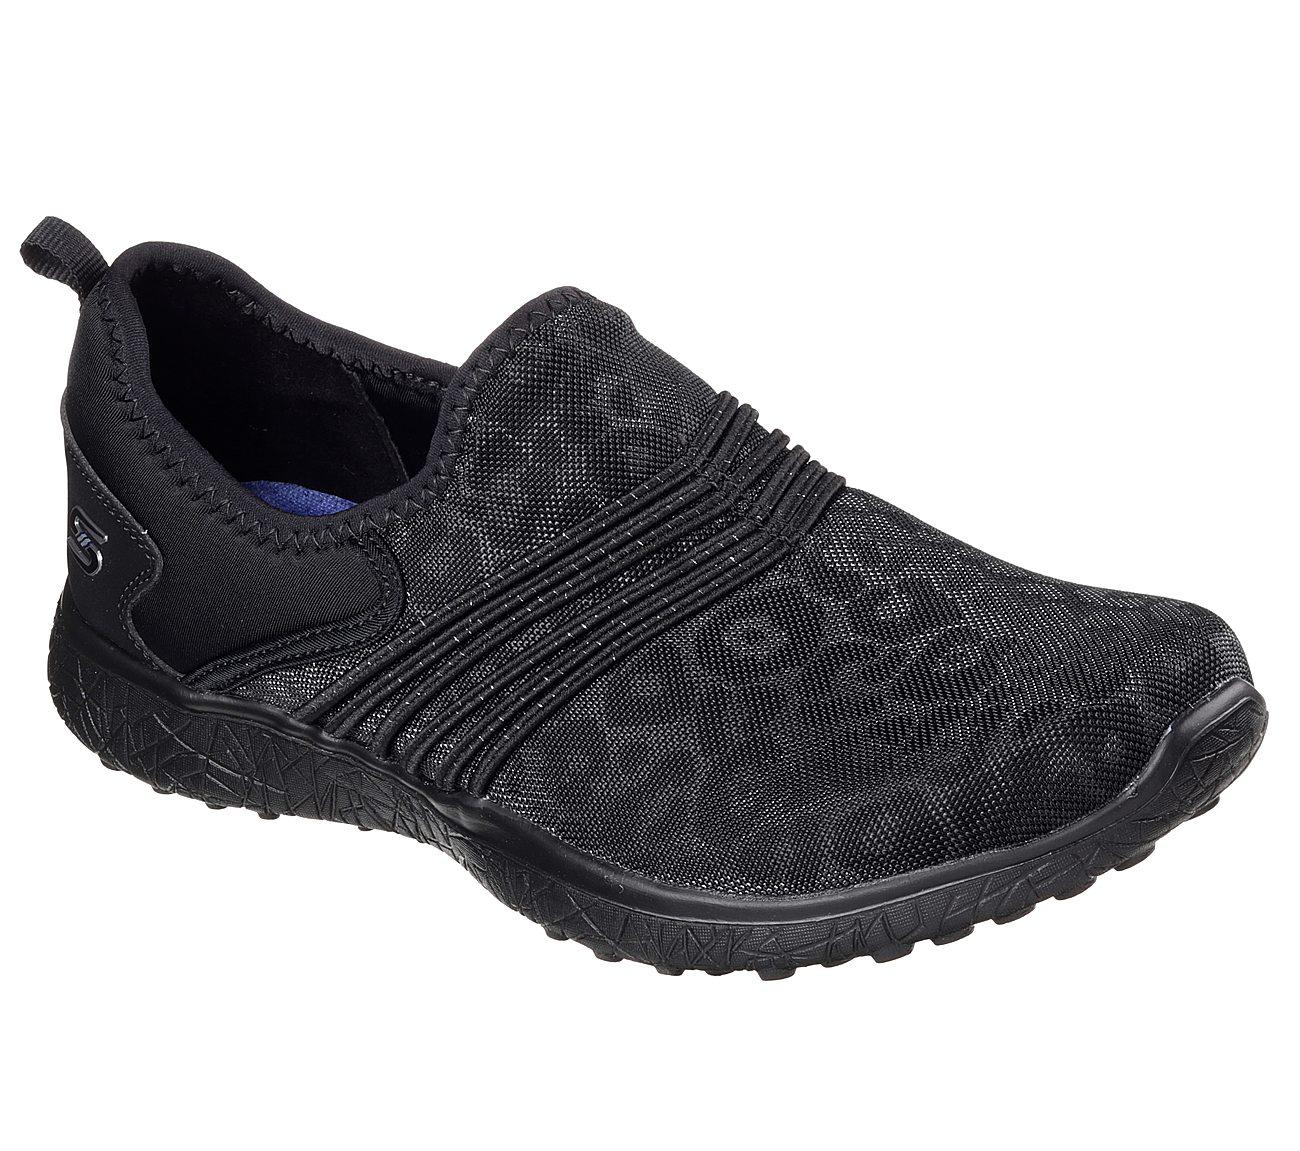 Buy SKECHERS Microburst Under Wraps SKECHERS Sport Active Shoes only 64 00